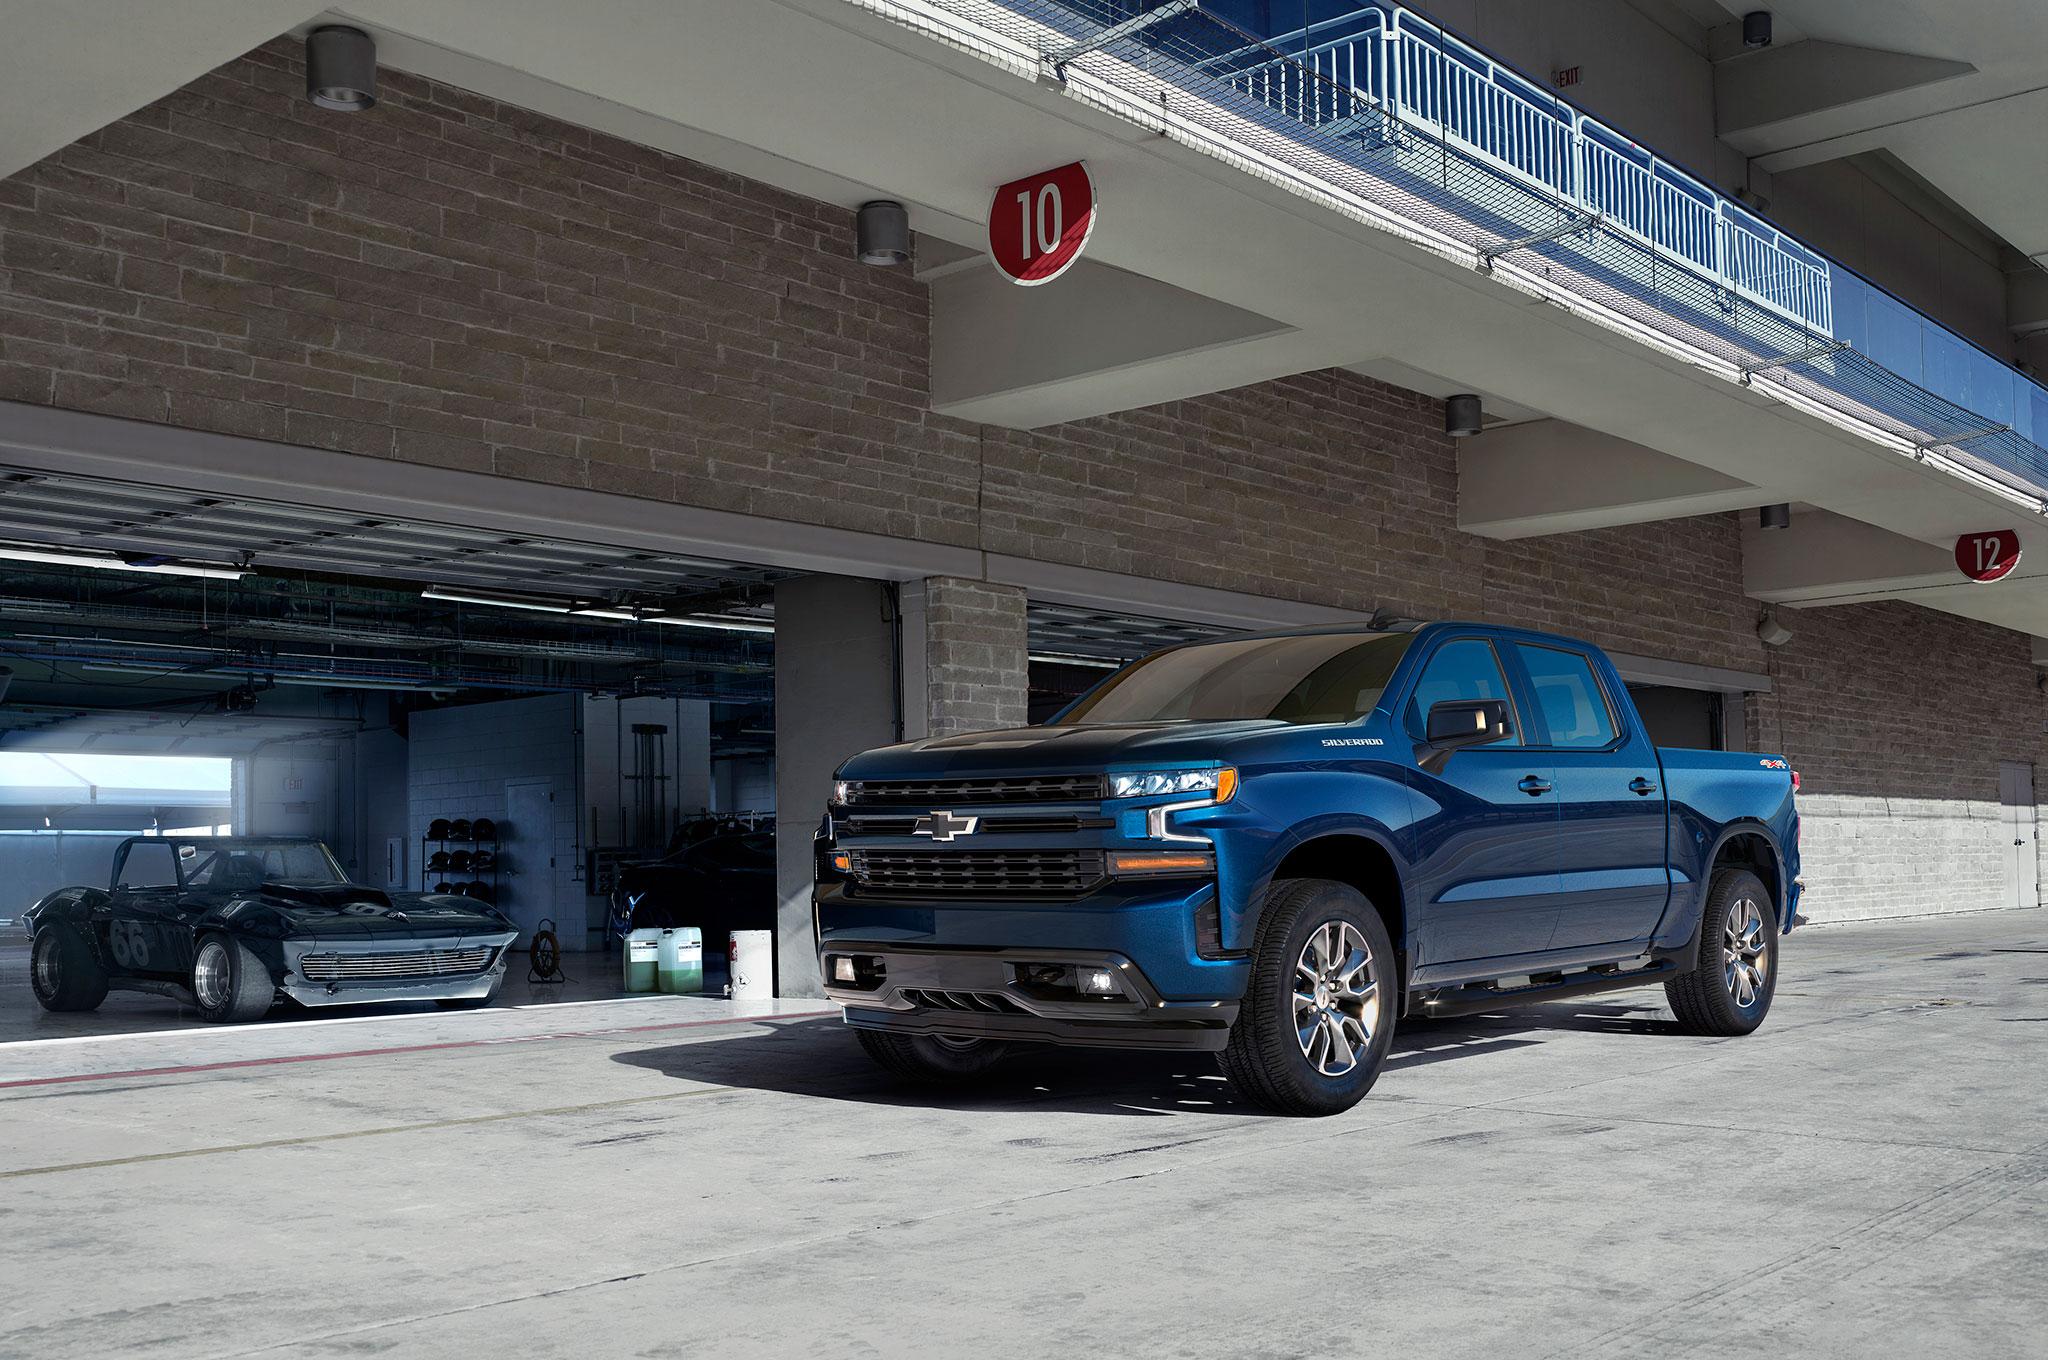 2019 Chevrolet Silverado 1500 Revealed In Detroit